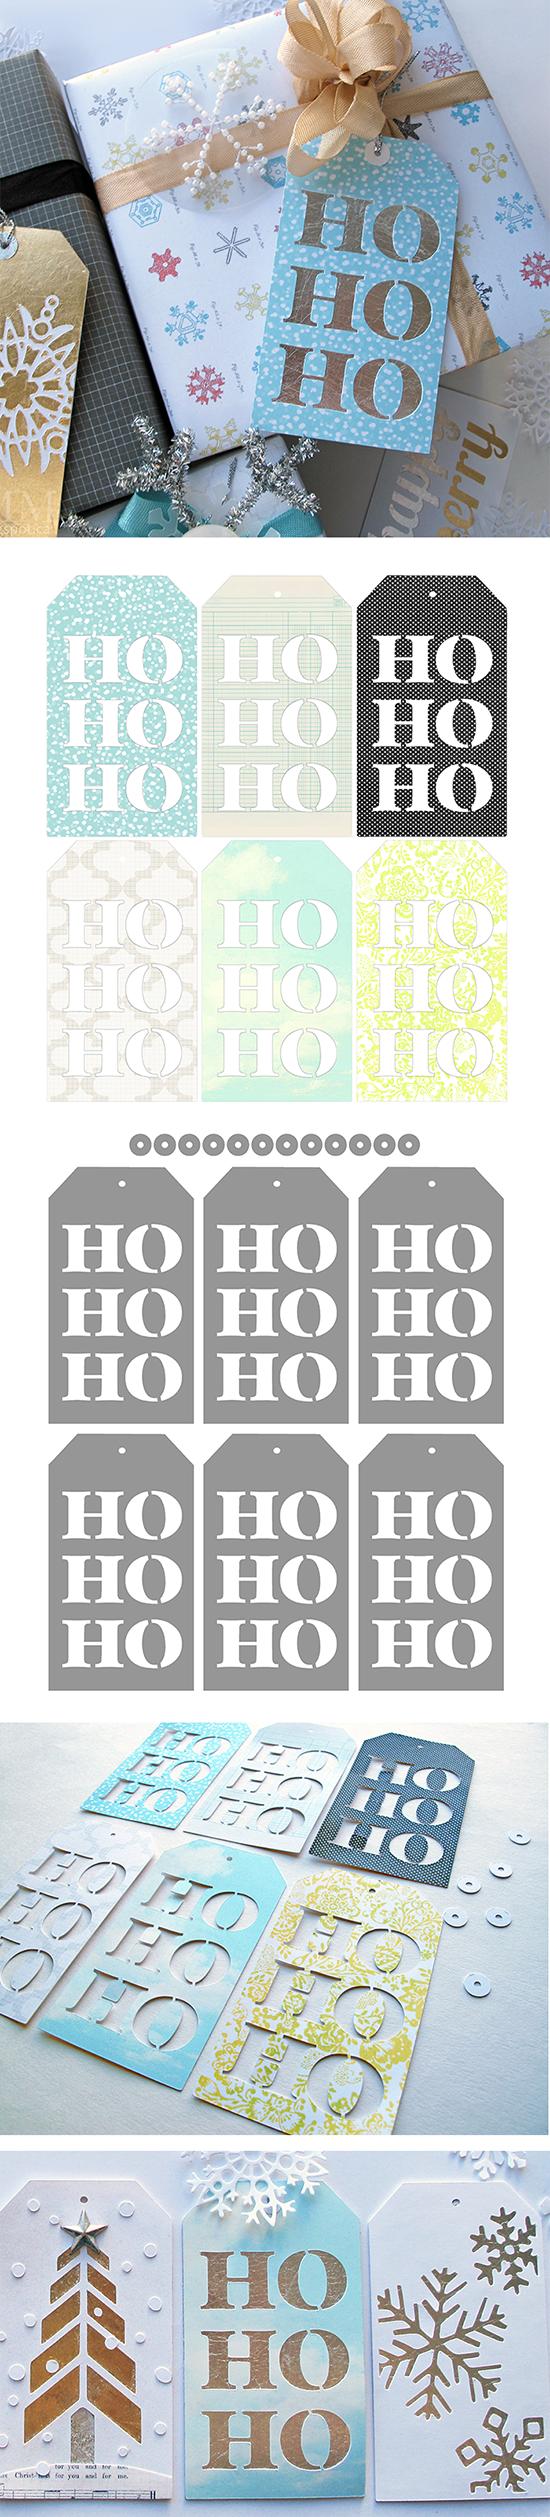 Ho ho holiday printouts to color - Free Ho Ho Ho Christmas Tags Cutting Files Printables Silhouette